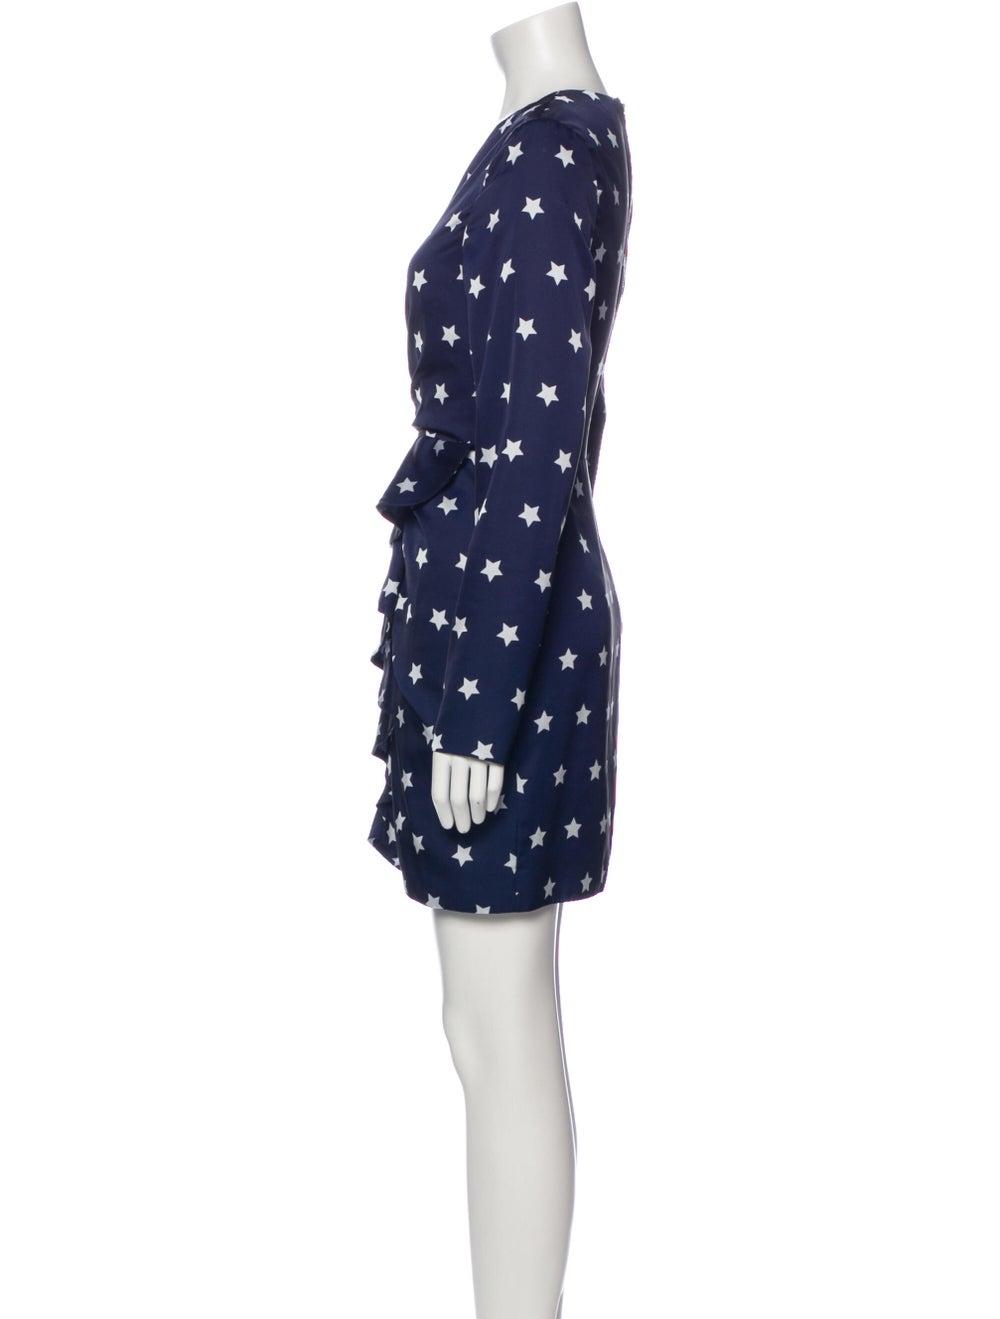 Self-Portrait Printed Mini Dress Blue - image 2